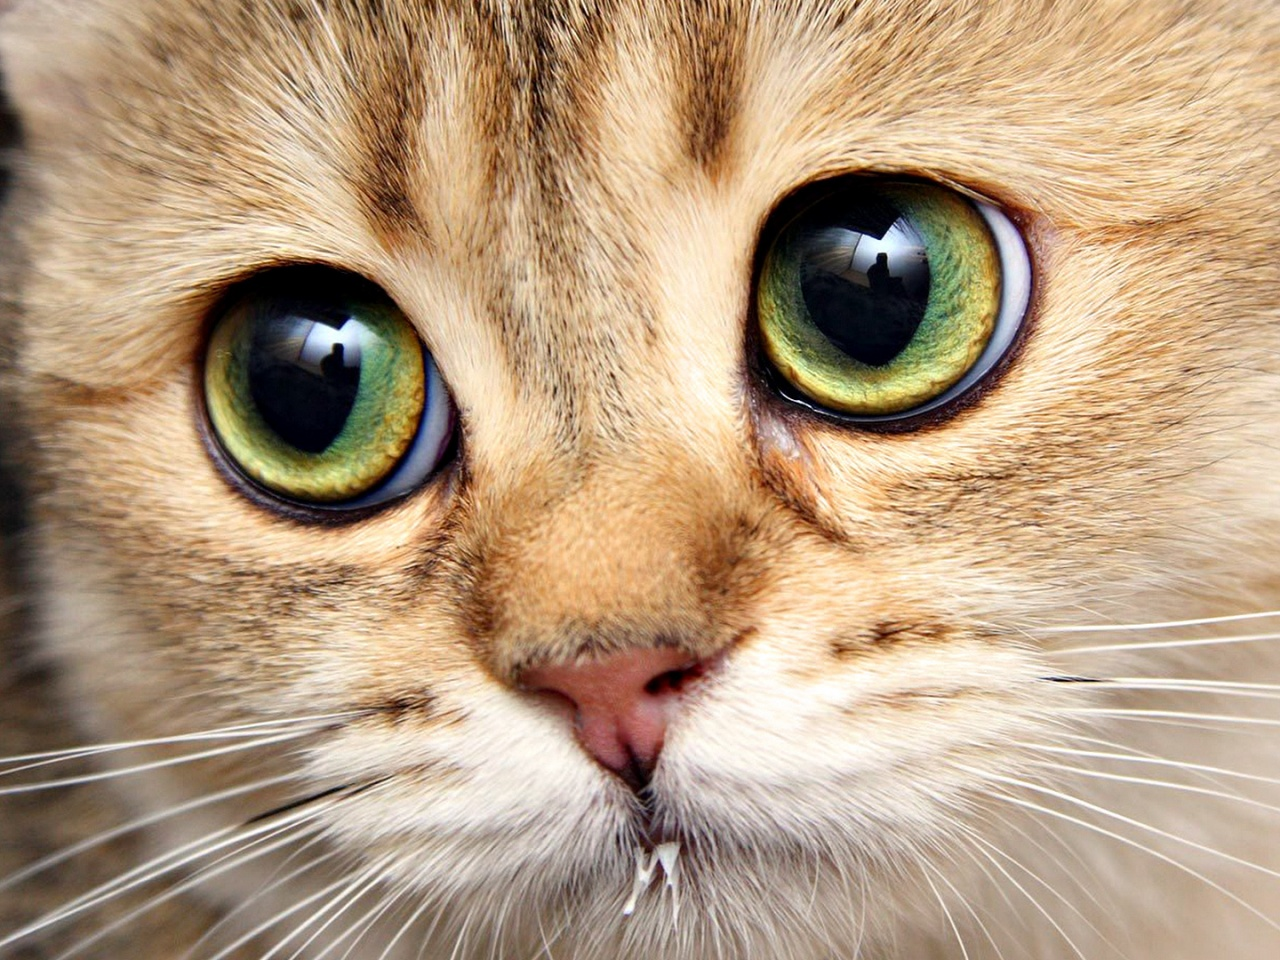 Sad cat eyes